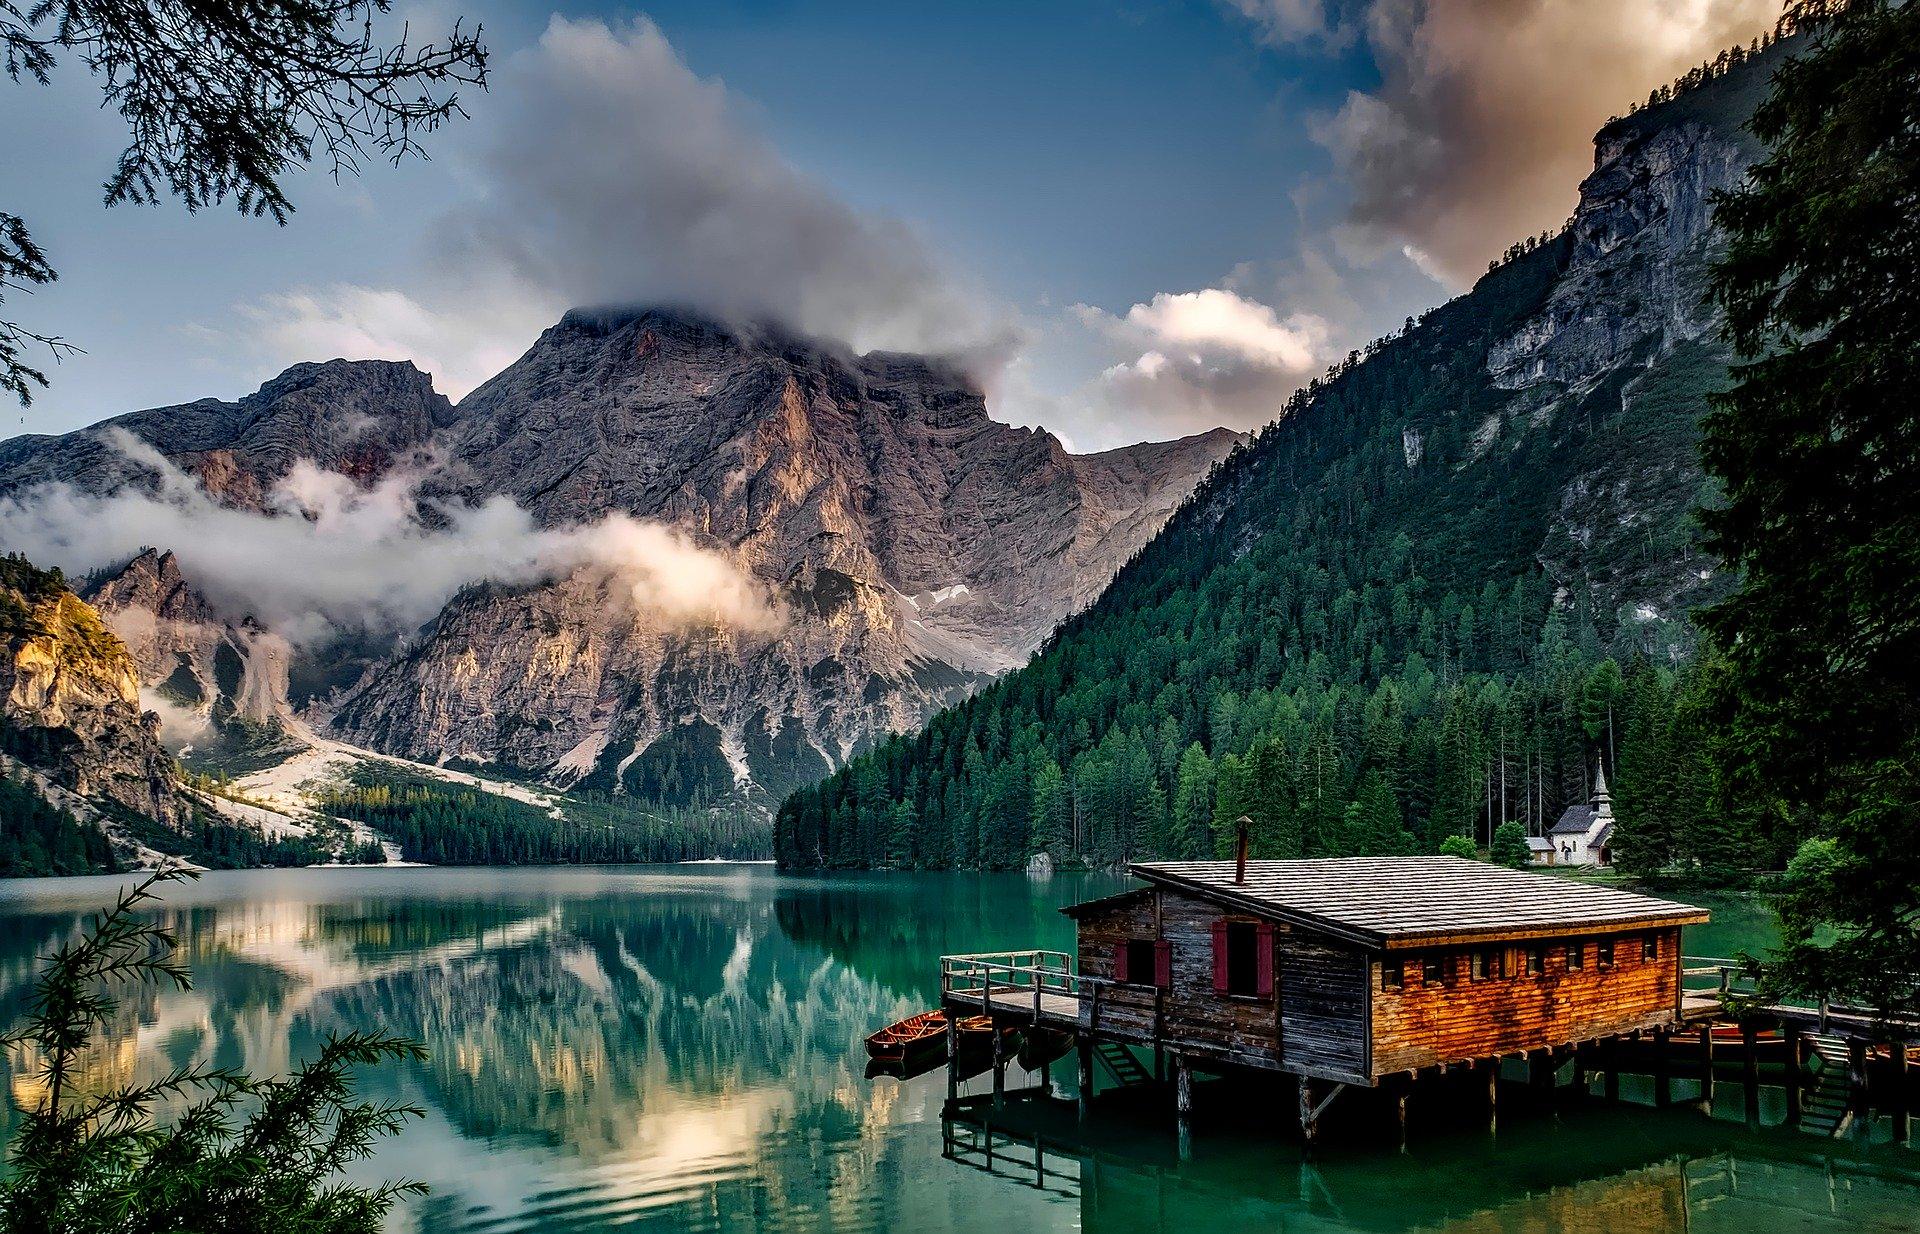 Fiskado - Traumhaus Anglerhütte am Bergsee - Blog -